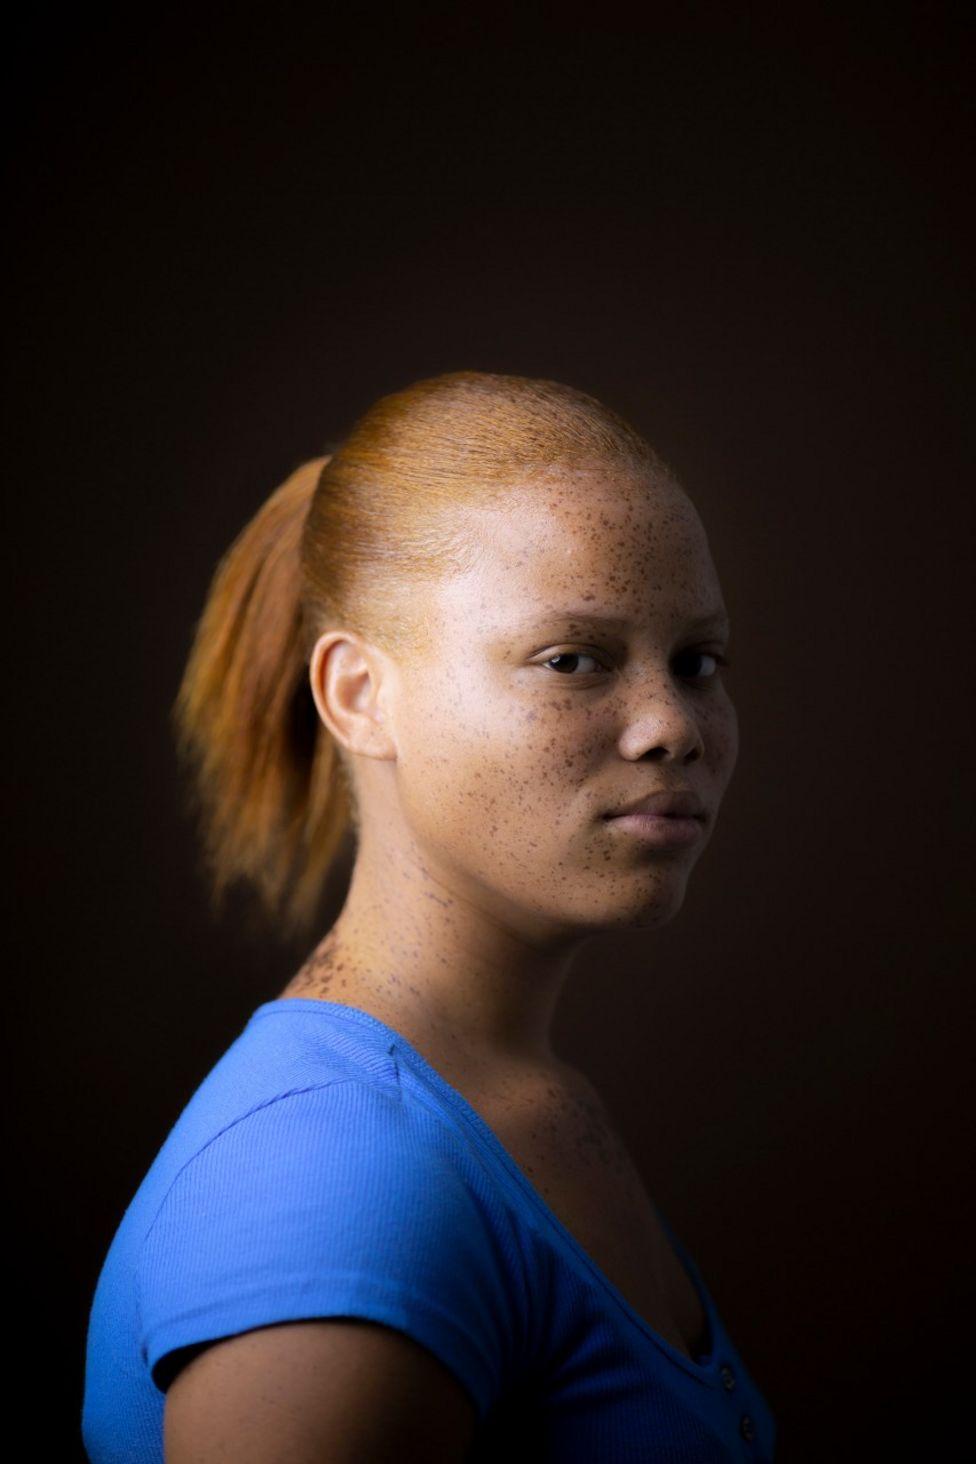 Marteka Nembhard - Jamaica - nascida em 2005